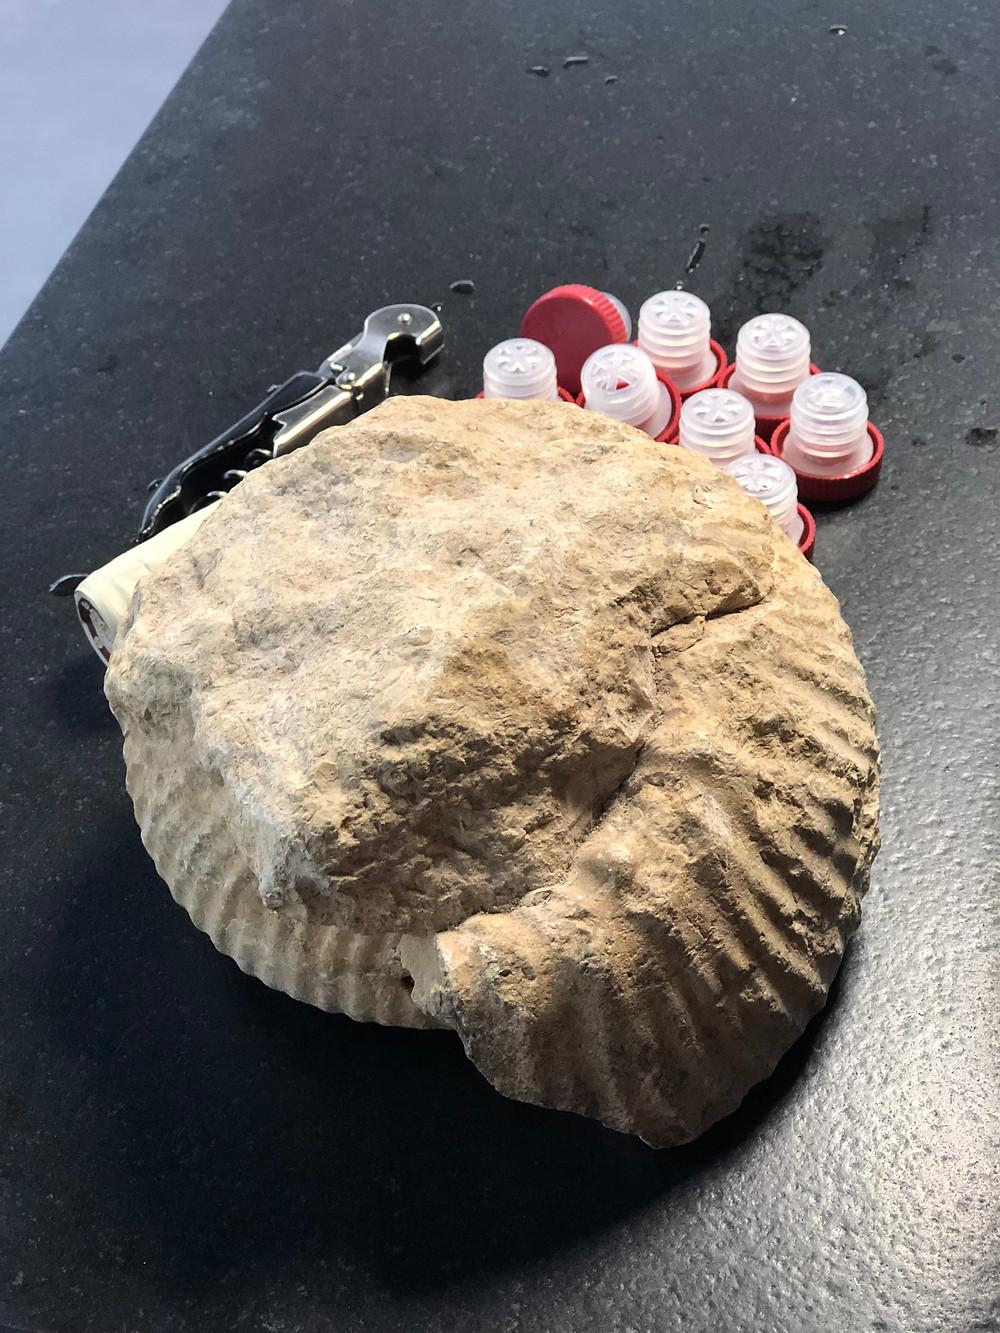 fossil marl stones from Kimmeridgian soils in Chablis